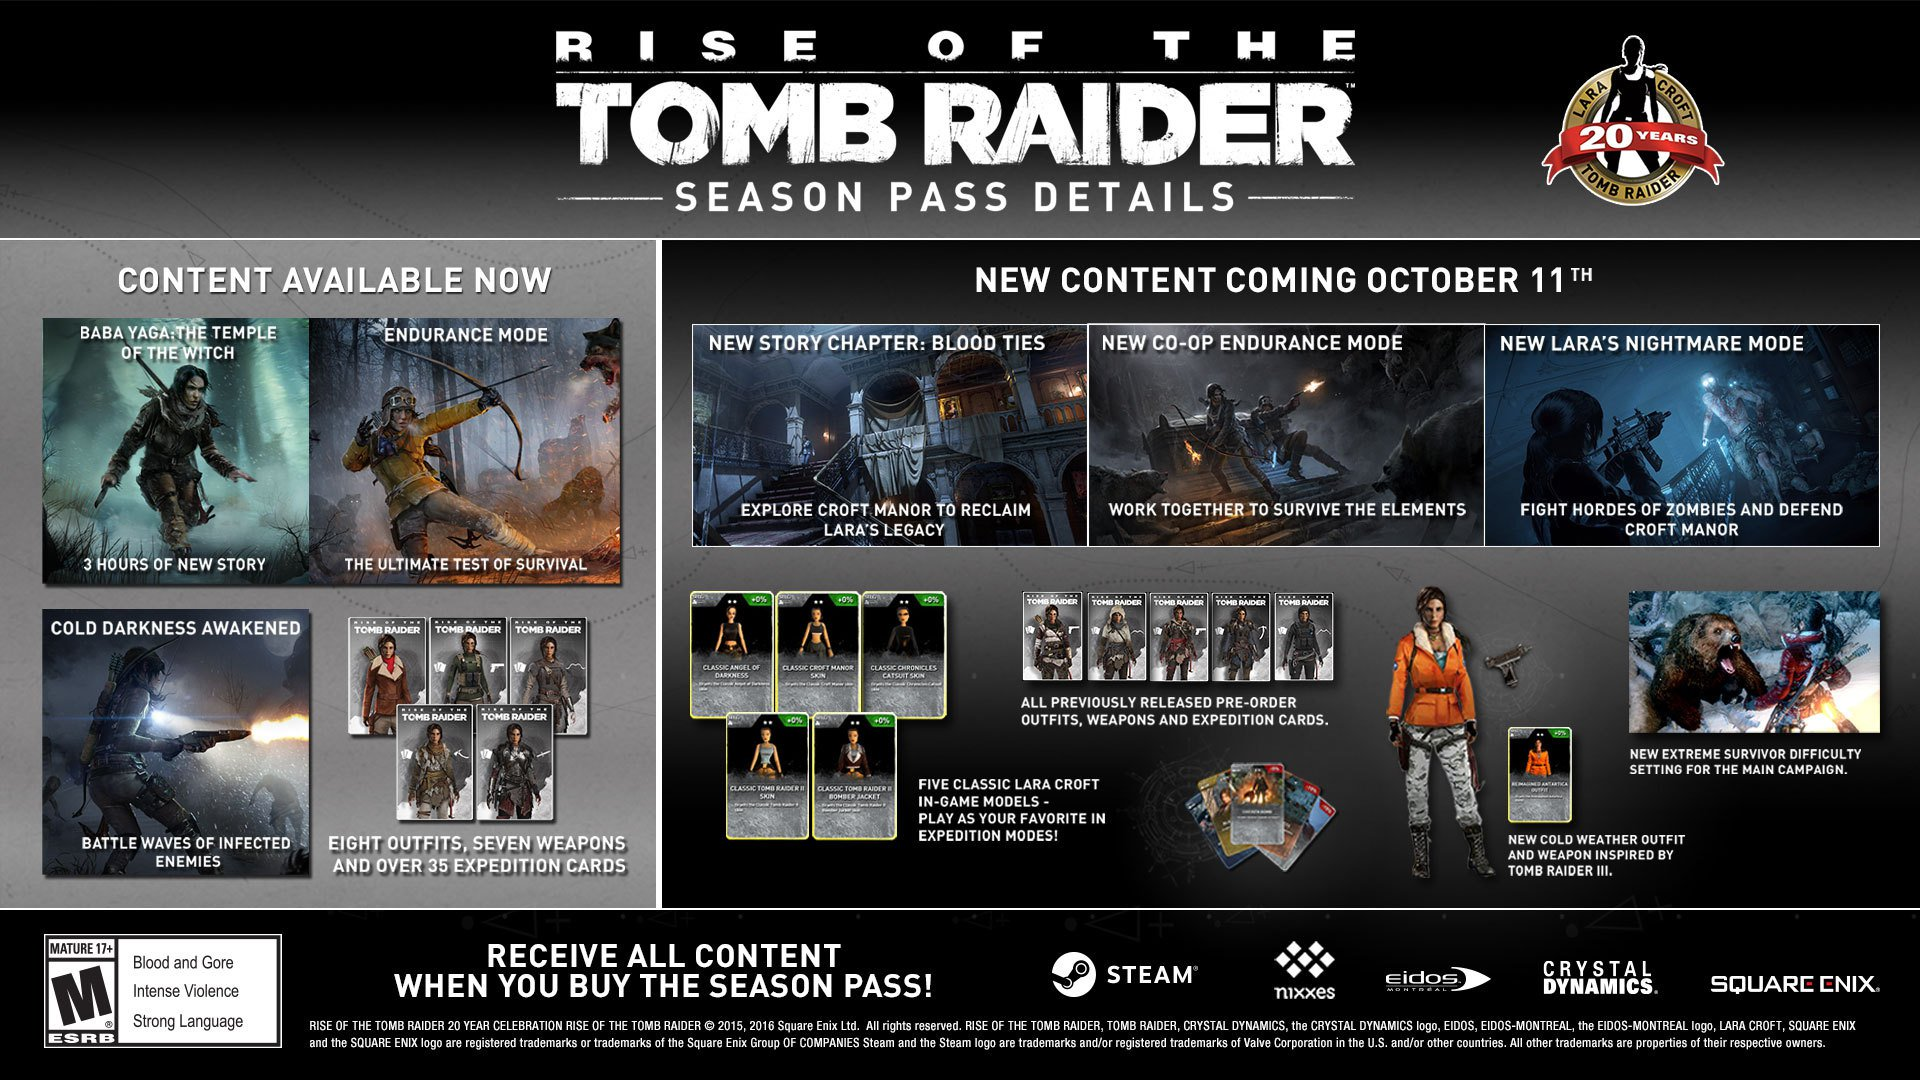 Shadow of the Tomb Raider Season Pass 1